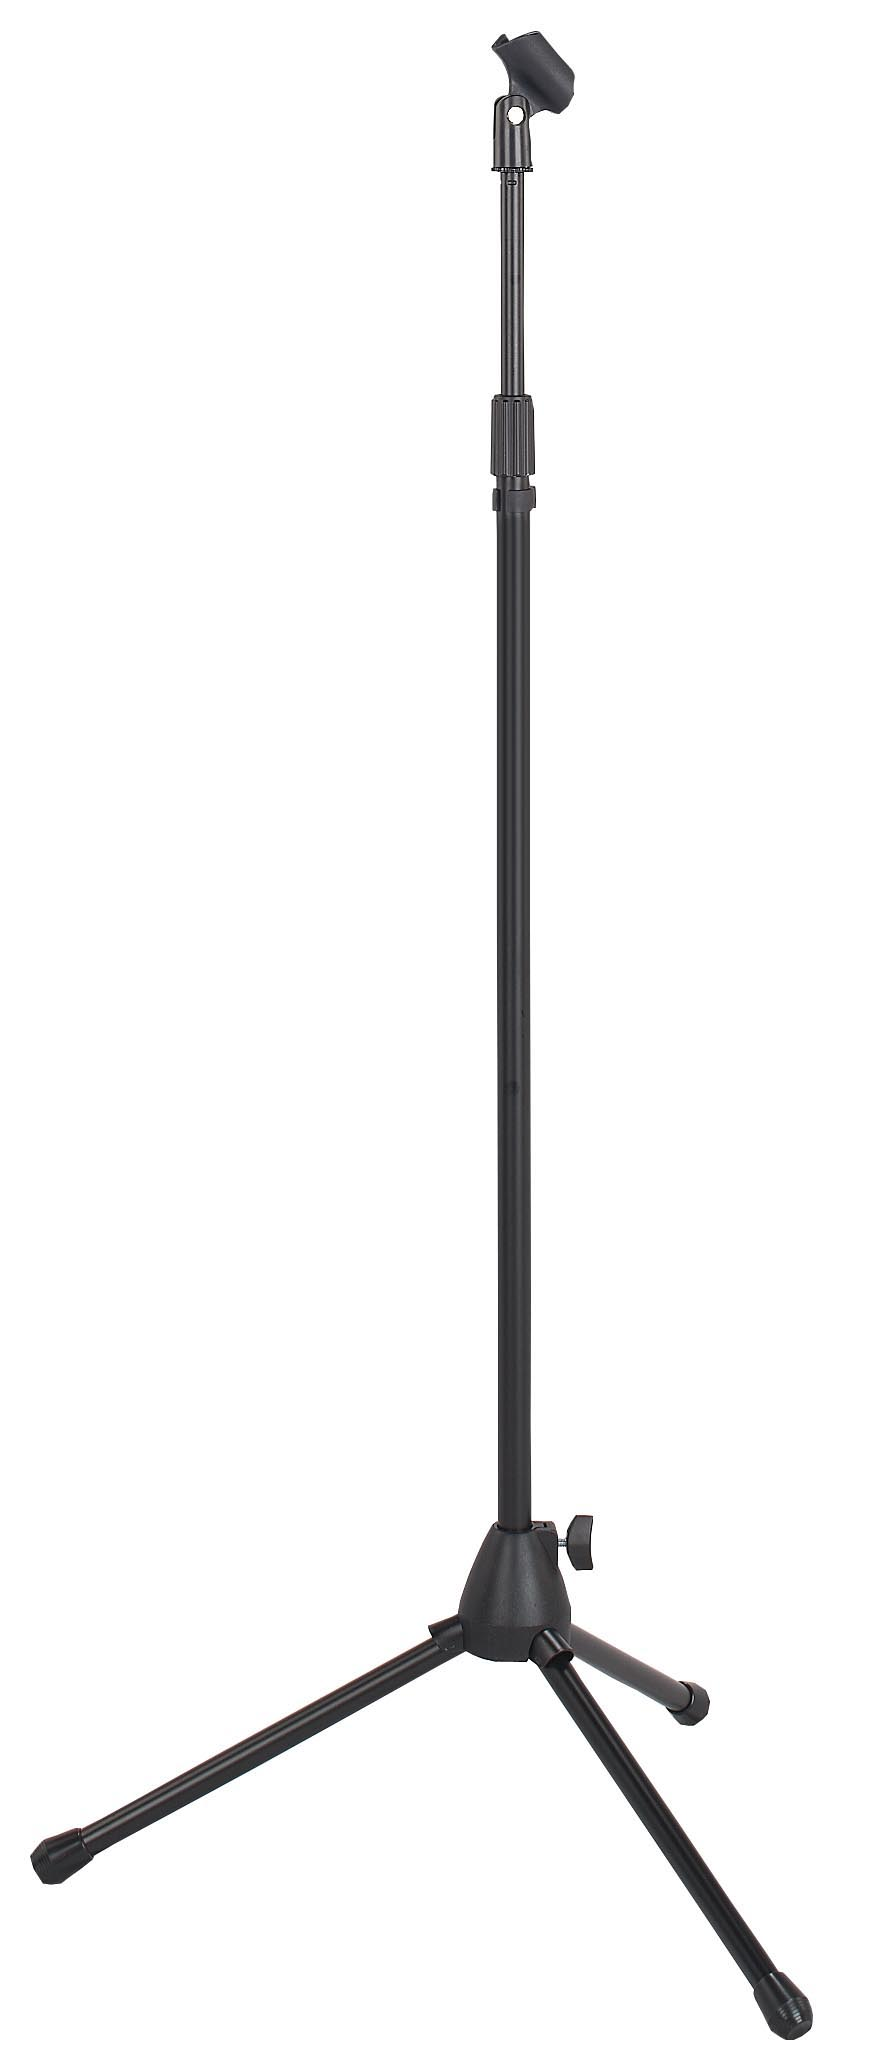 Amplivox S1073 Floor Microphone Tripod Stand